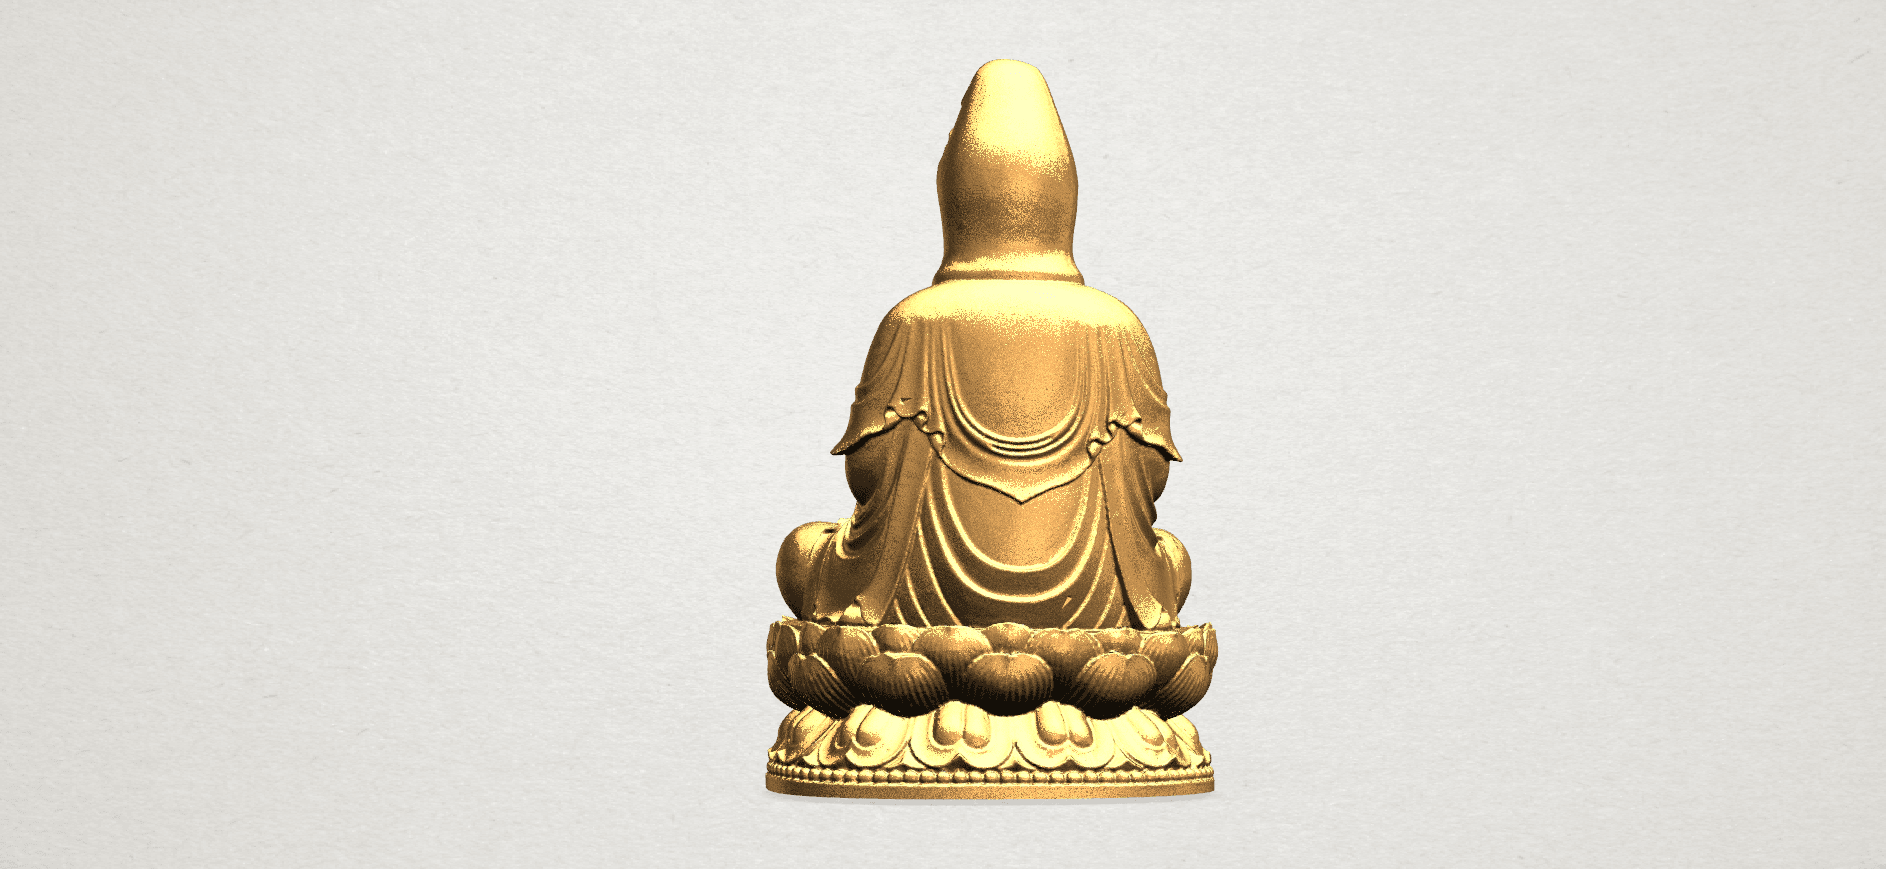 Bodhisattva Buddha - B03.png Download free STL file Avalokitesvara Bodhisattva 01 • 3D print object, GeorgesNikkei